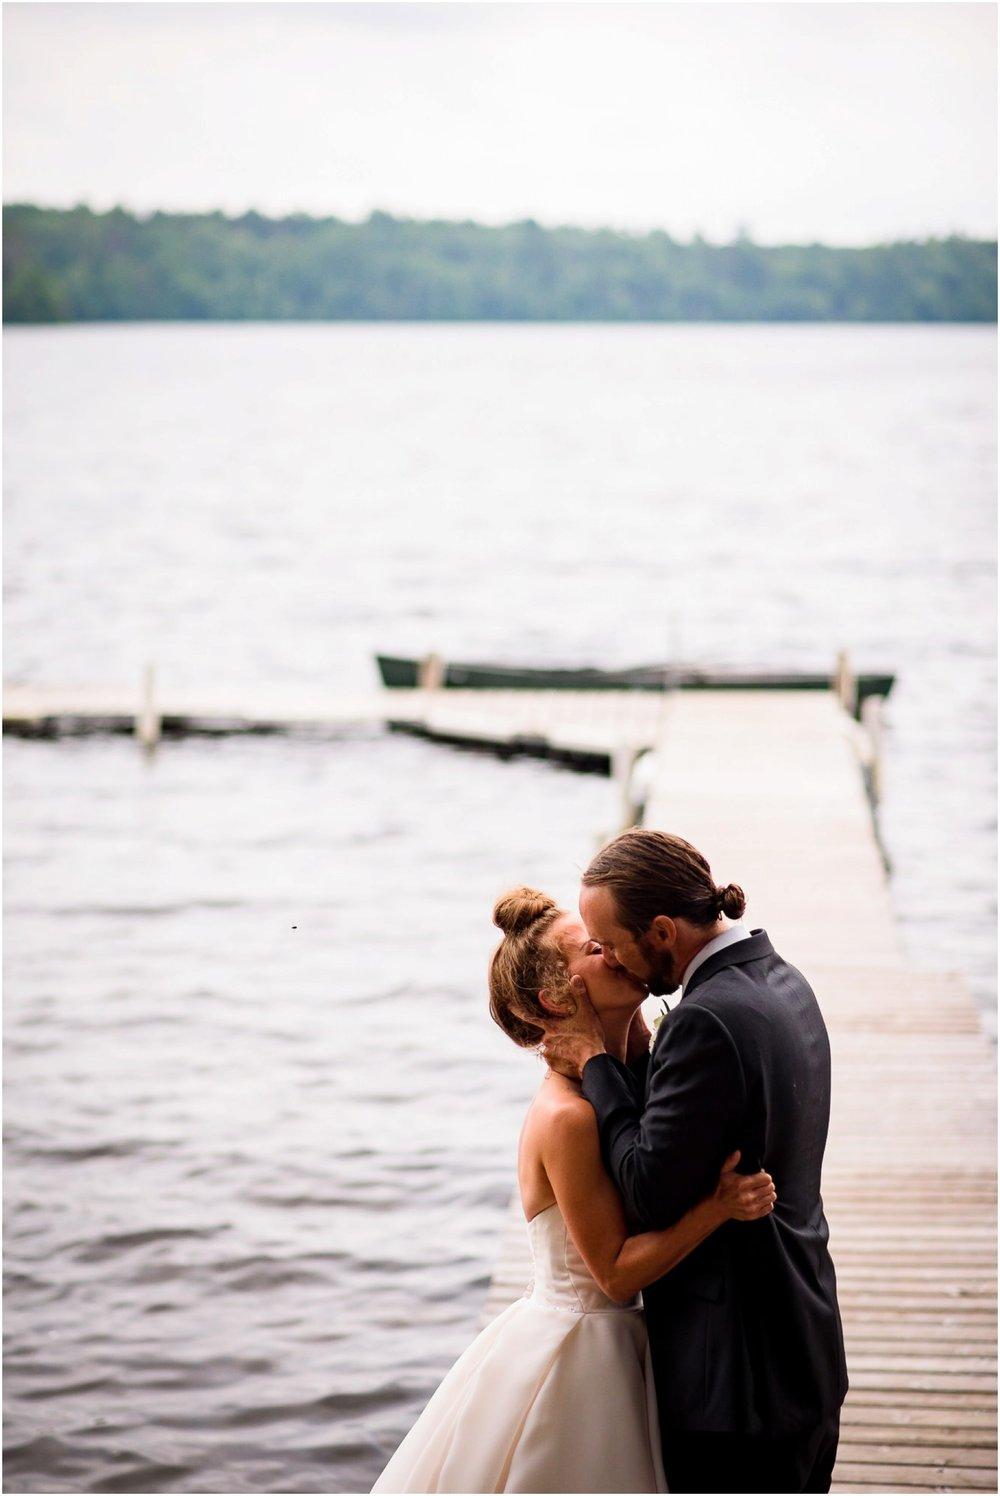 1st kiss on lake dock